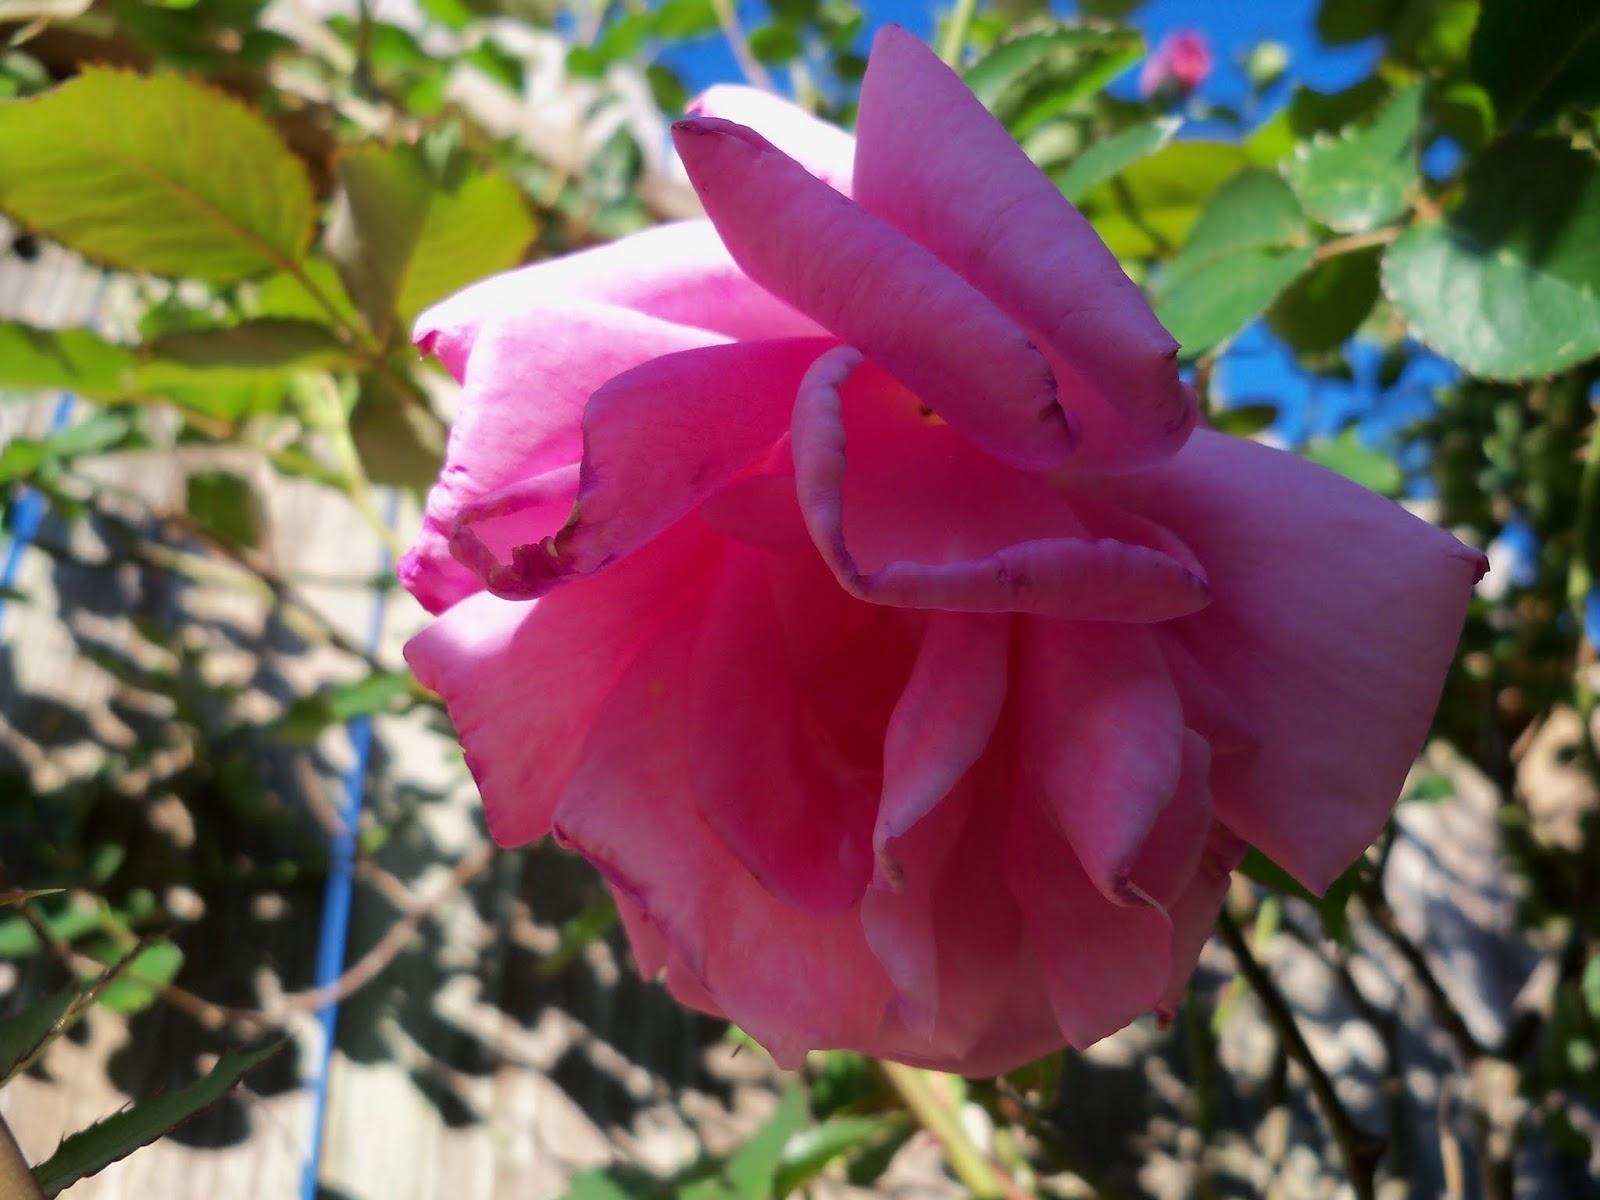 Gardening 2013 - 115_5401.JPG